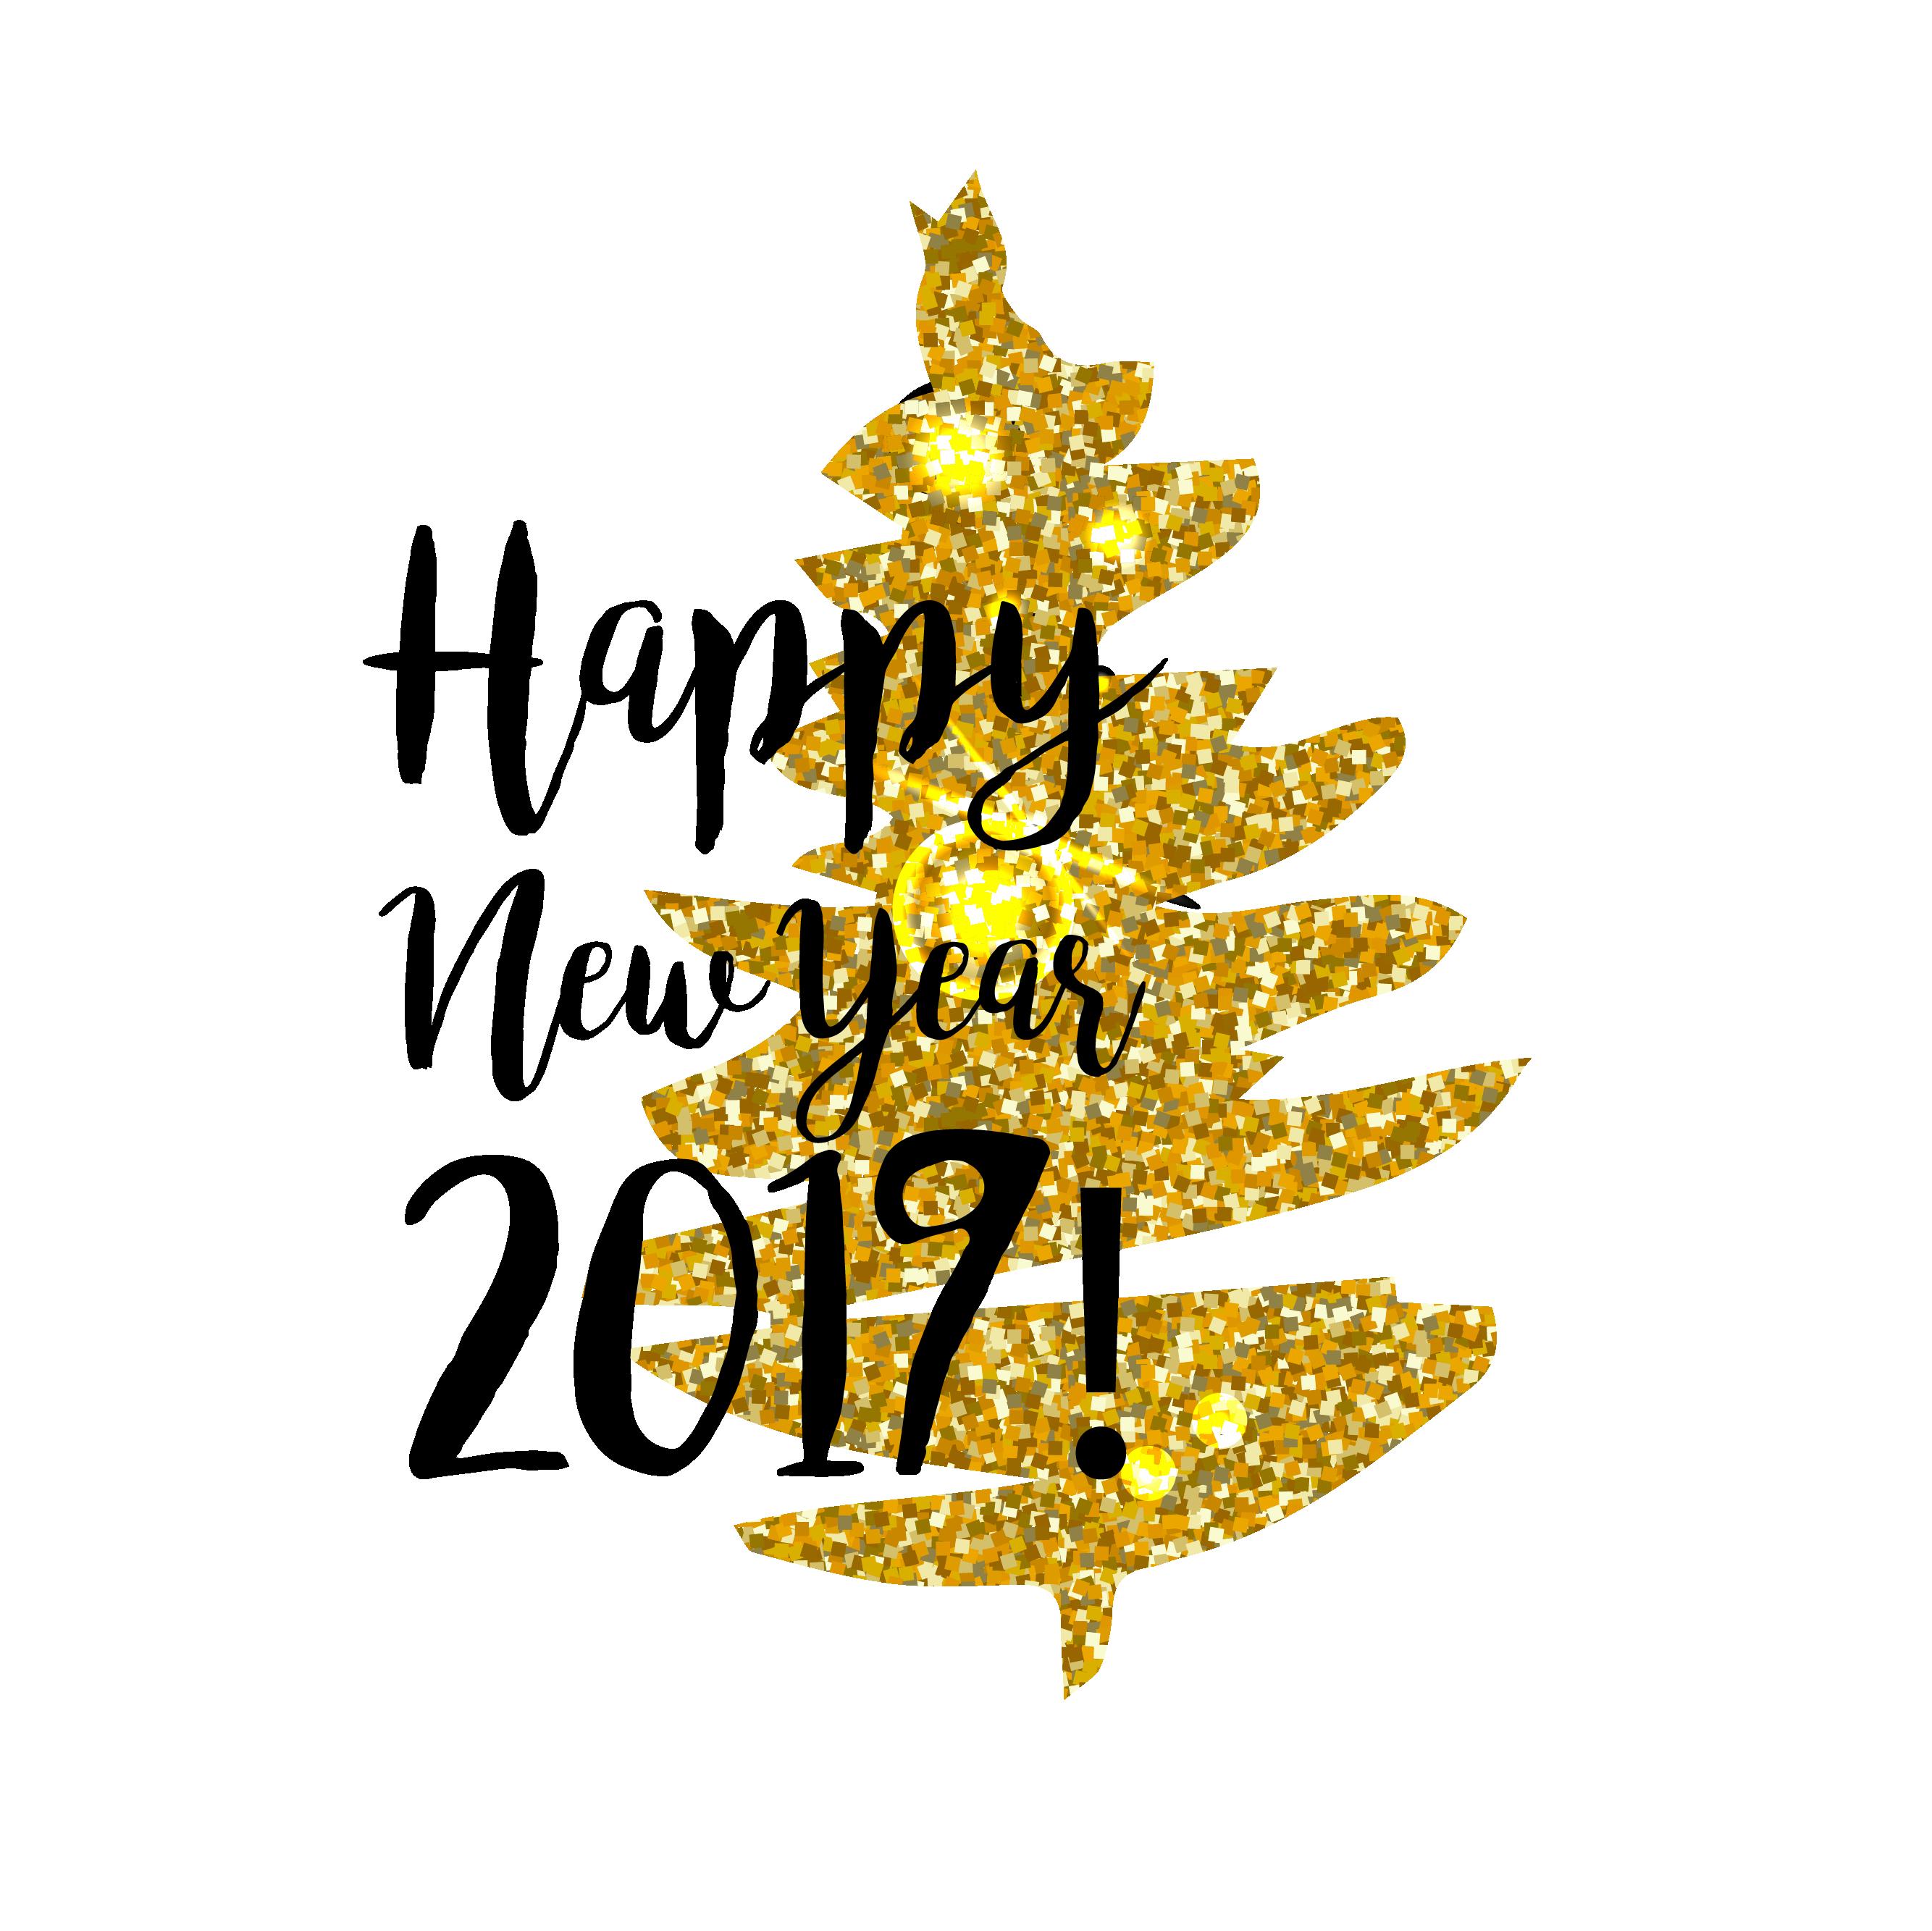 Happy New Year 2017 Celebration Card Design, Illustration.